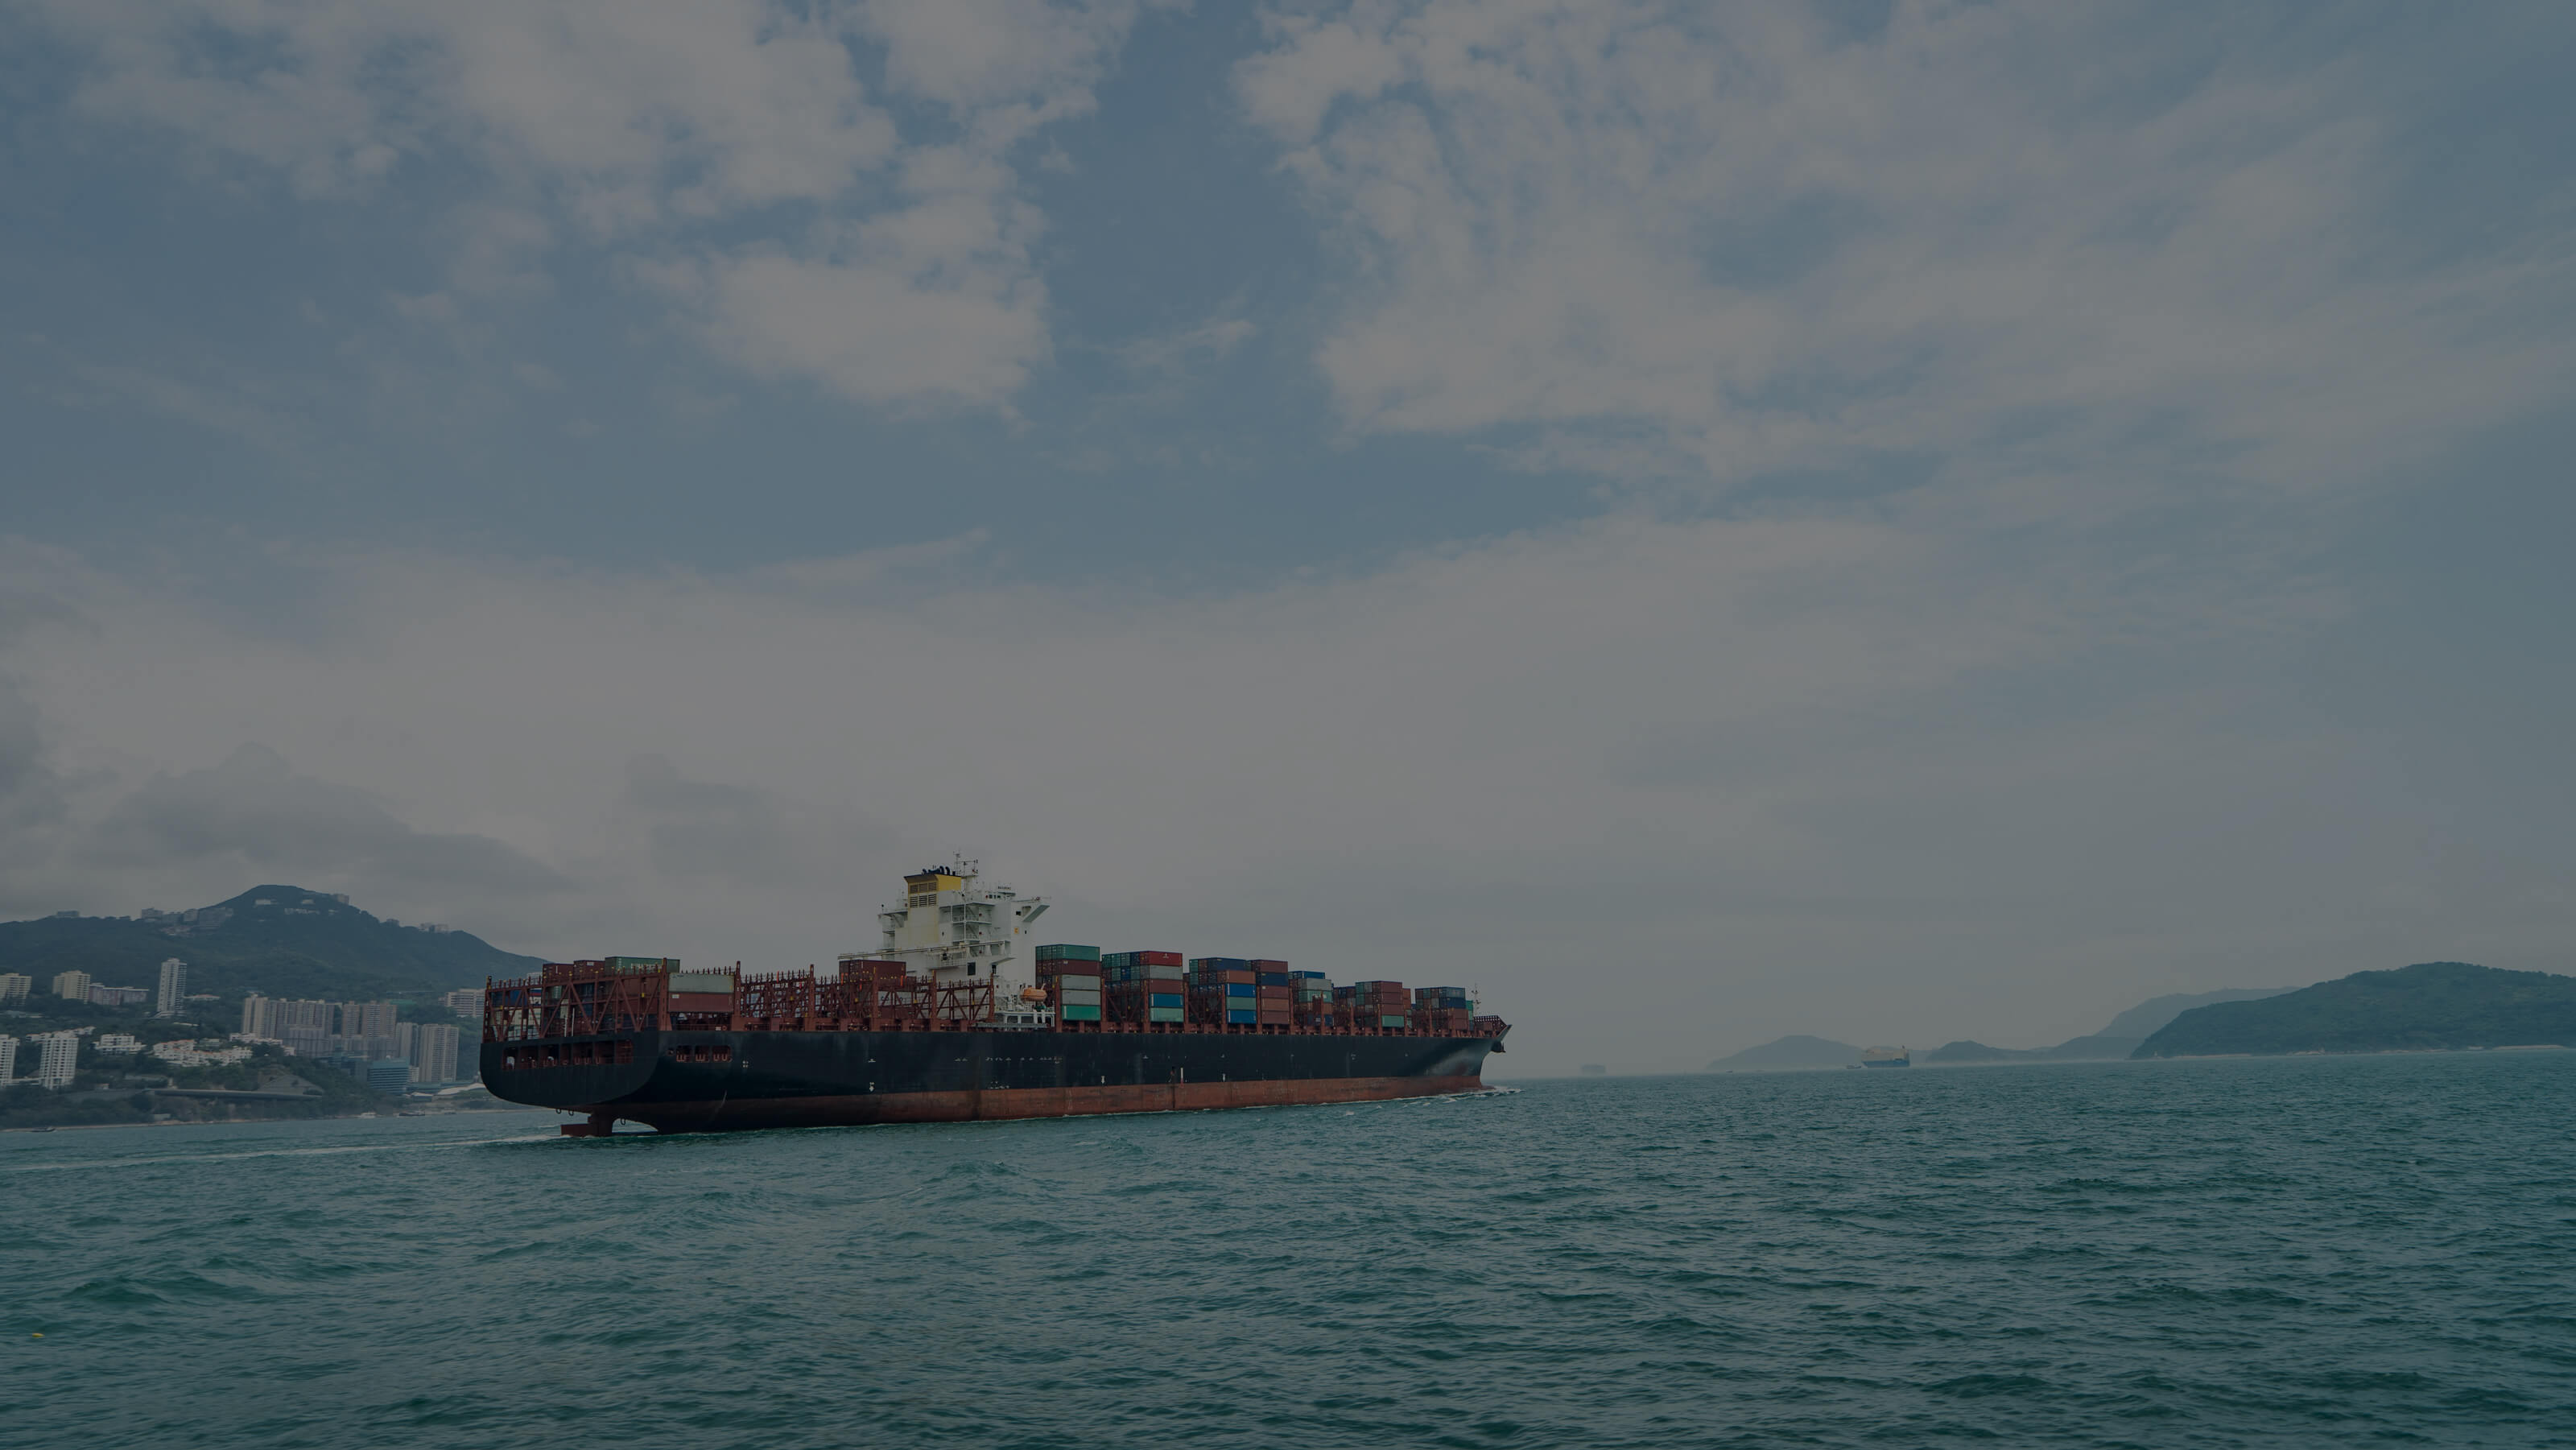 Ocean going container vessel leaving port.